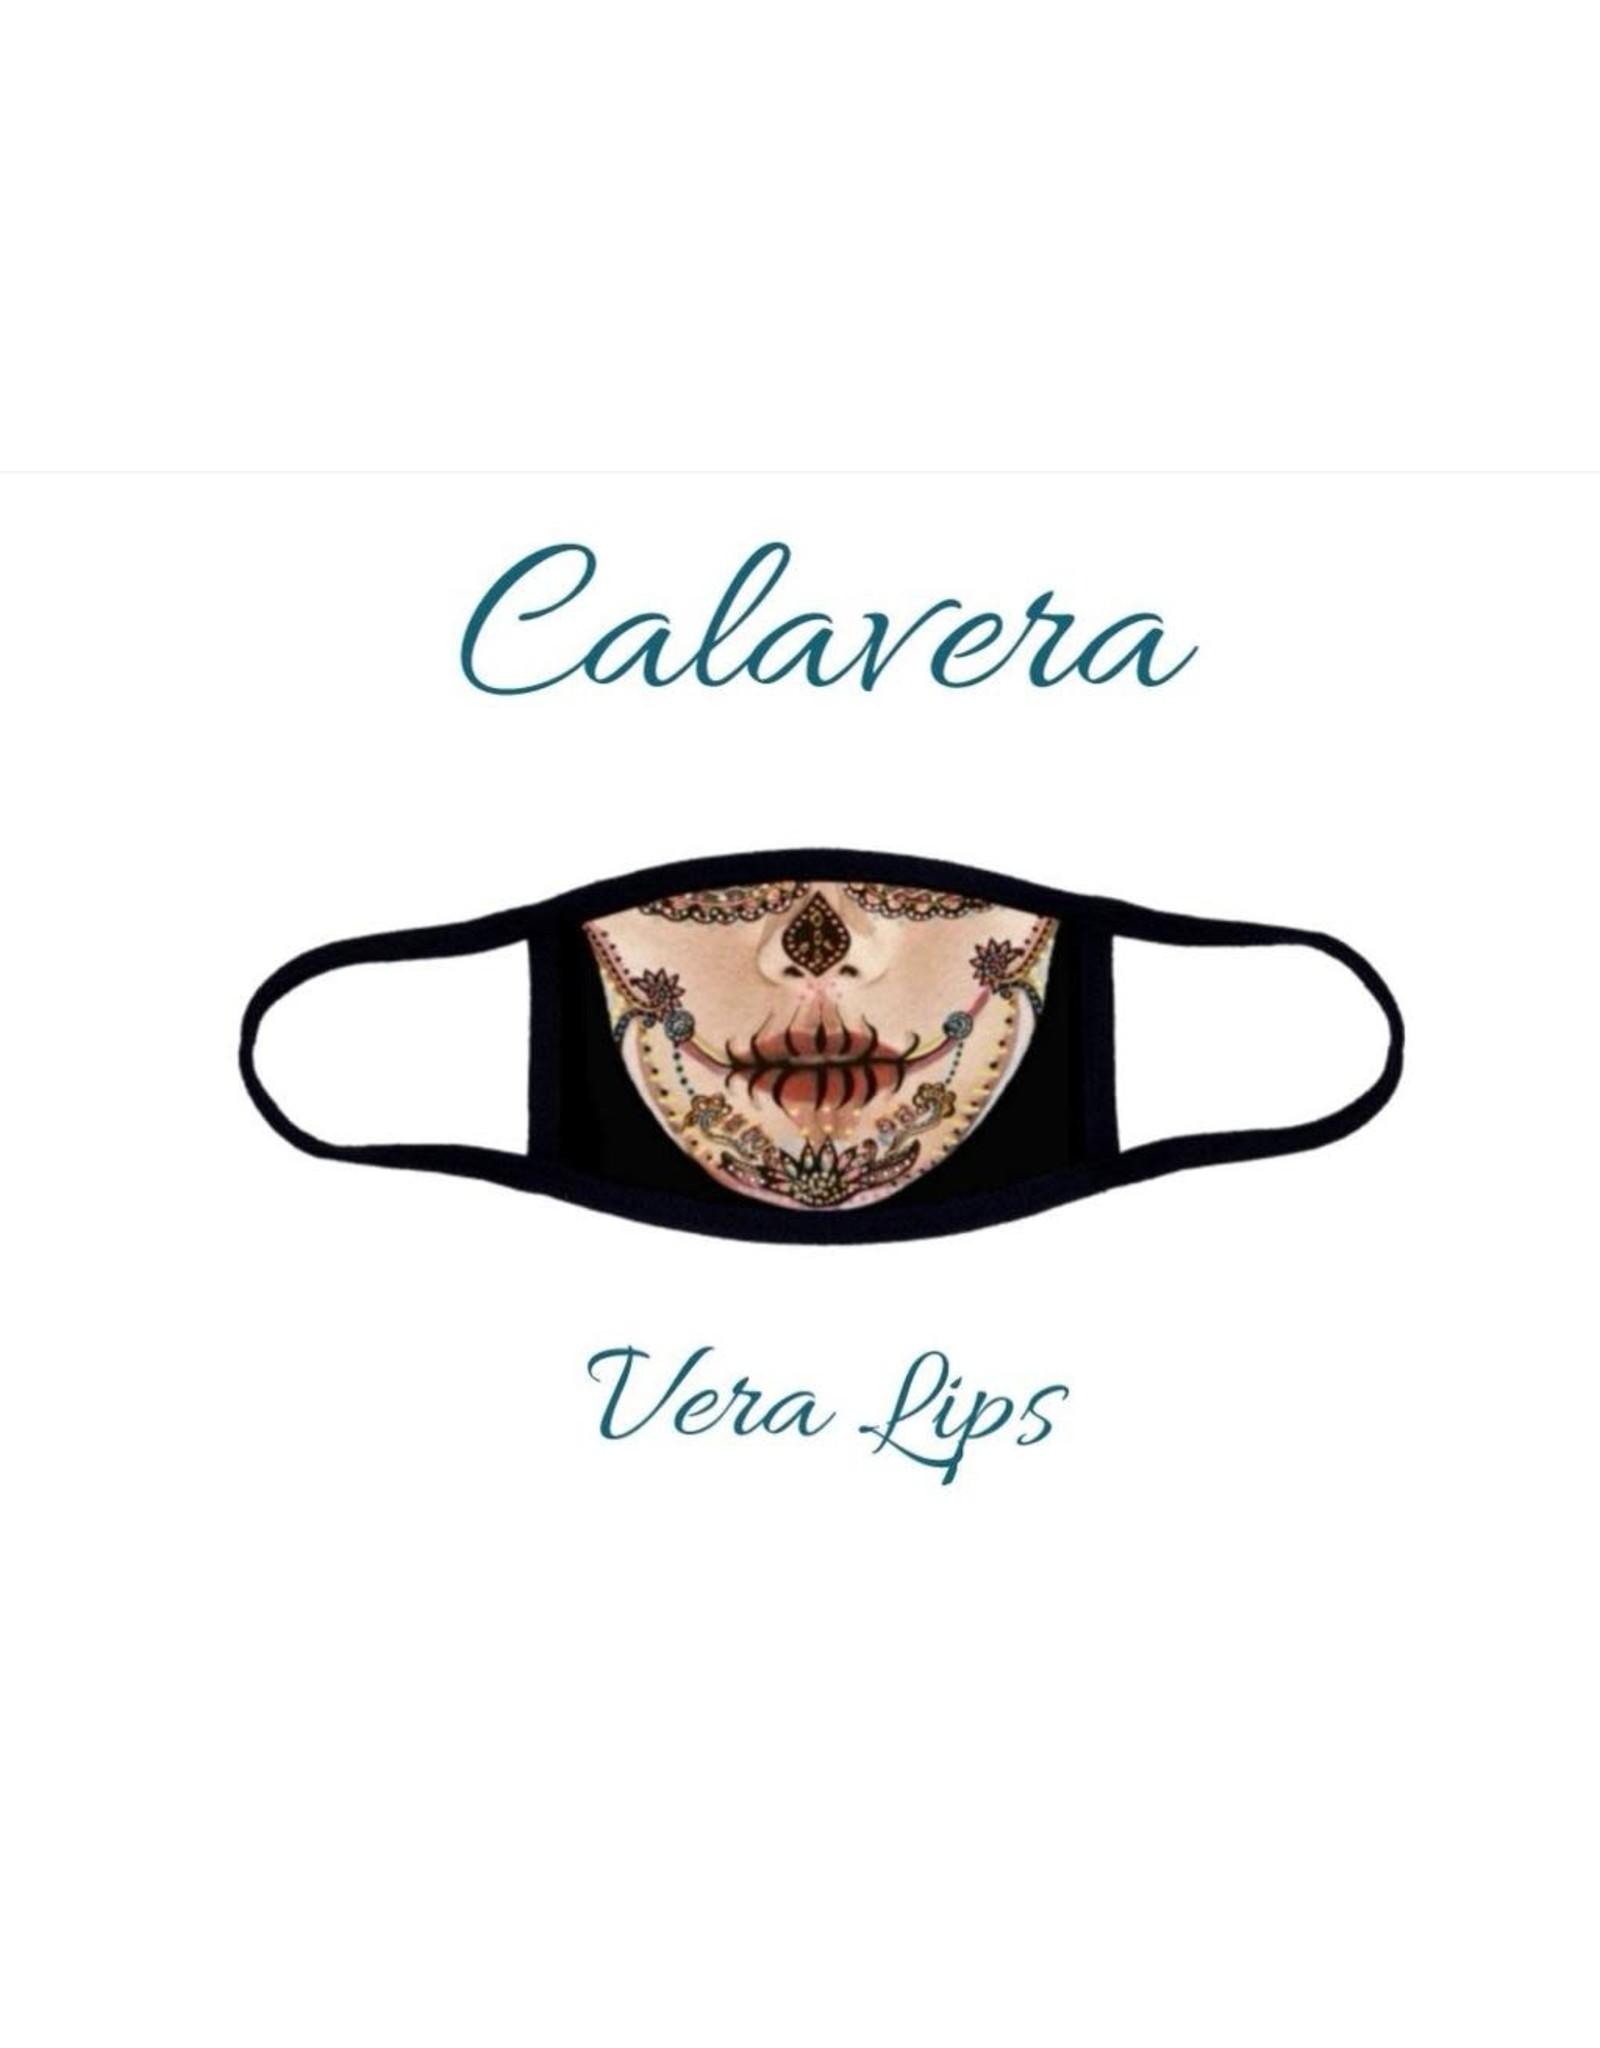 Catherine Eager Art Vera Lips-Calavera